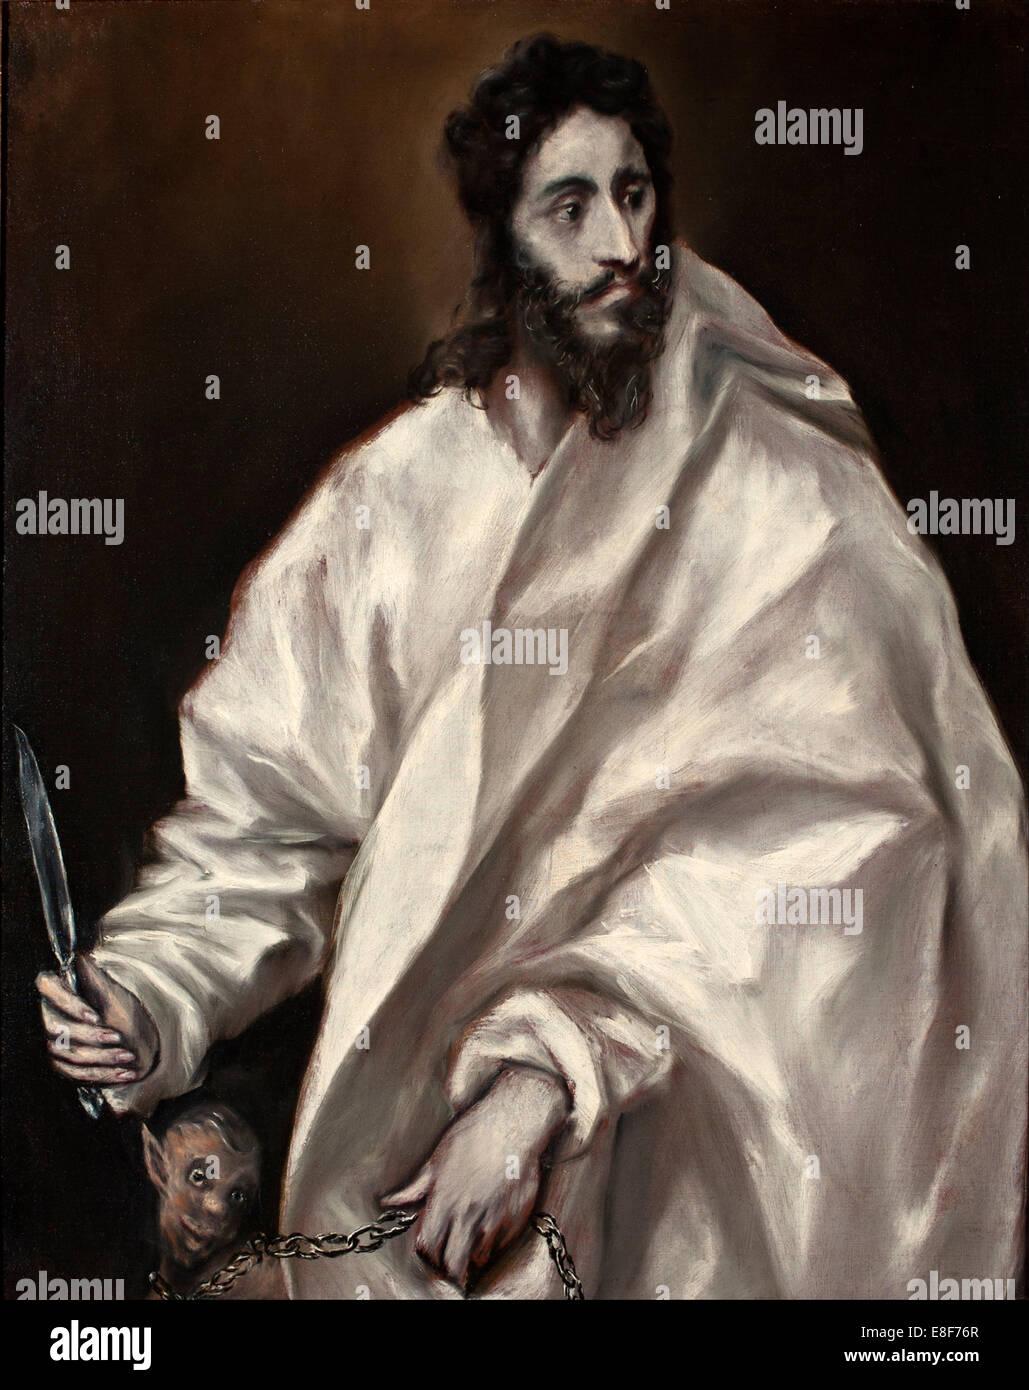 Saint Bartholomew. Artist: El Greco, Dominico (1541-1614) - Stock Image